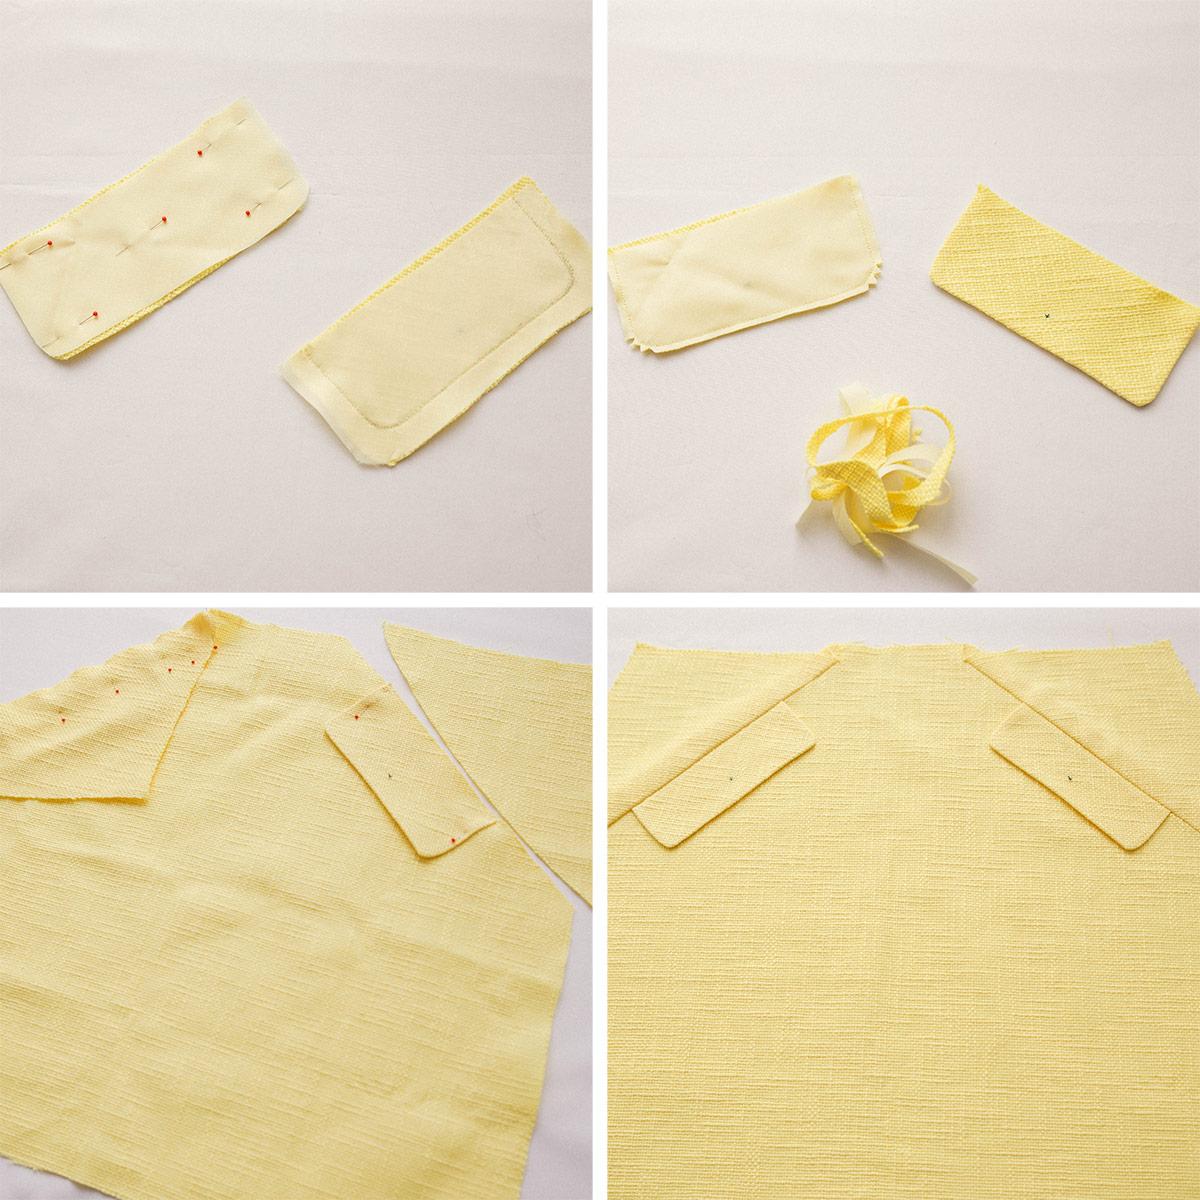 chanel-inspired-skirt-burda-thepetitecat-2